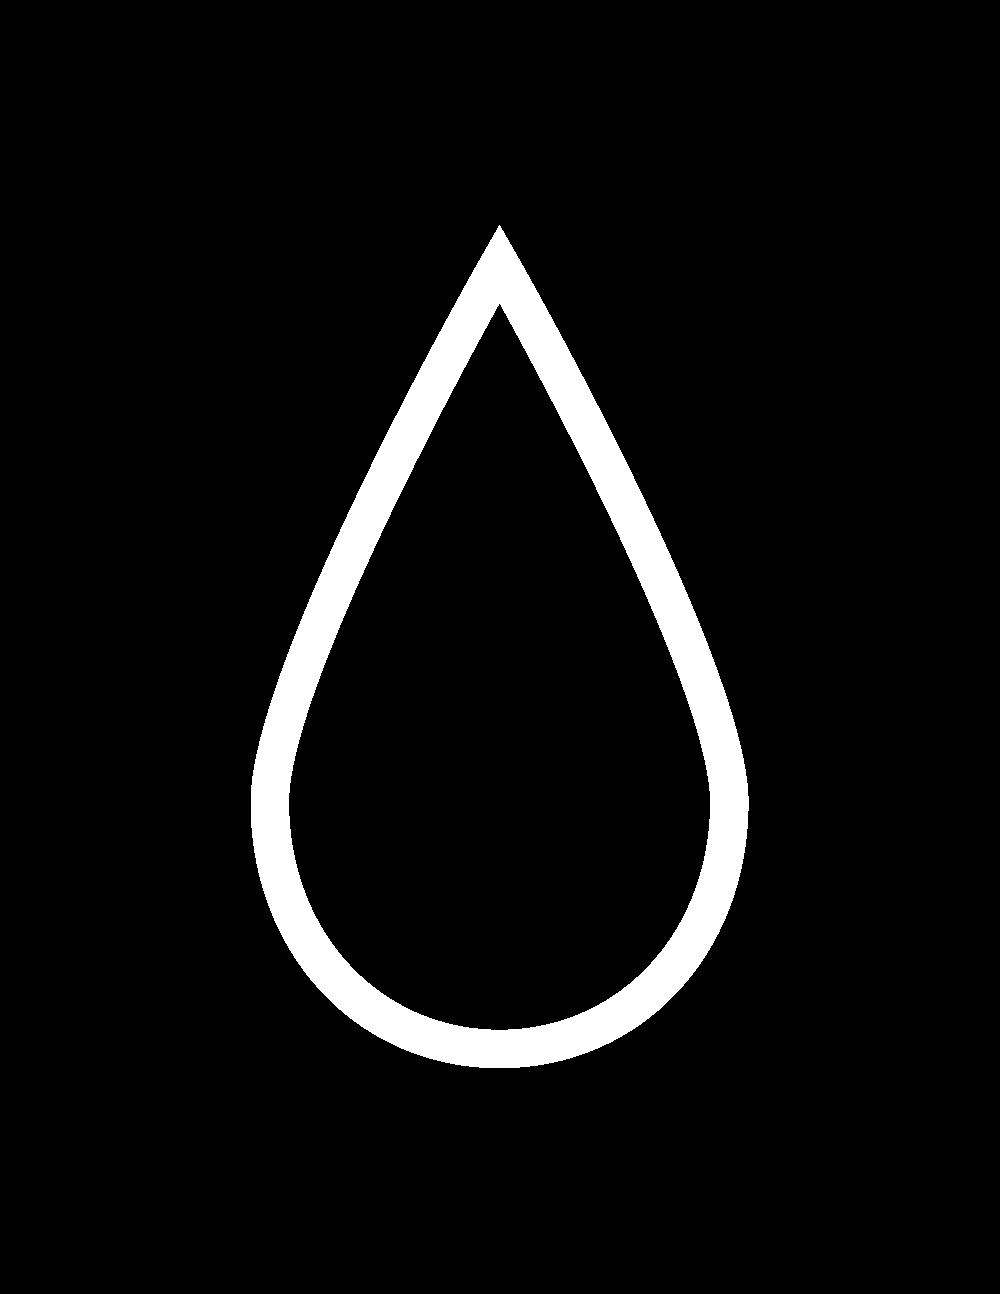 Big-White-Drop.png